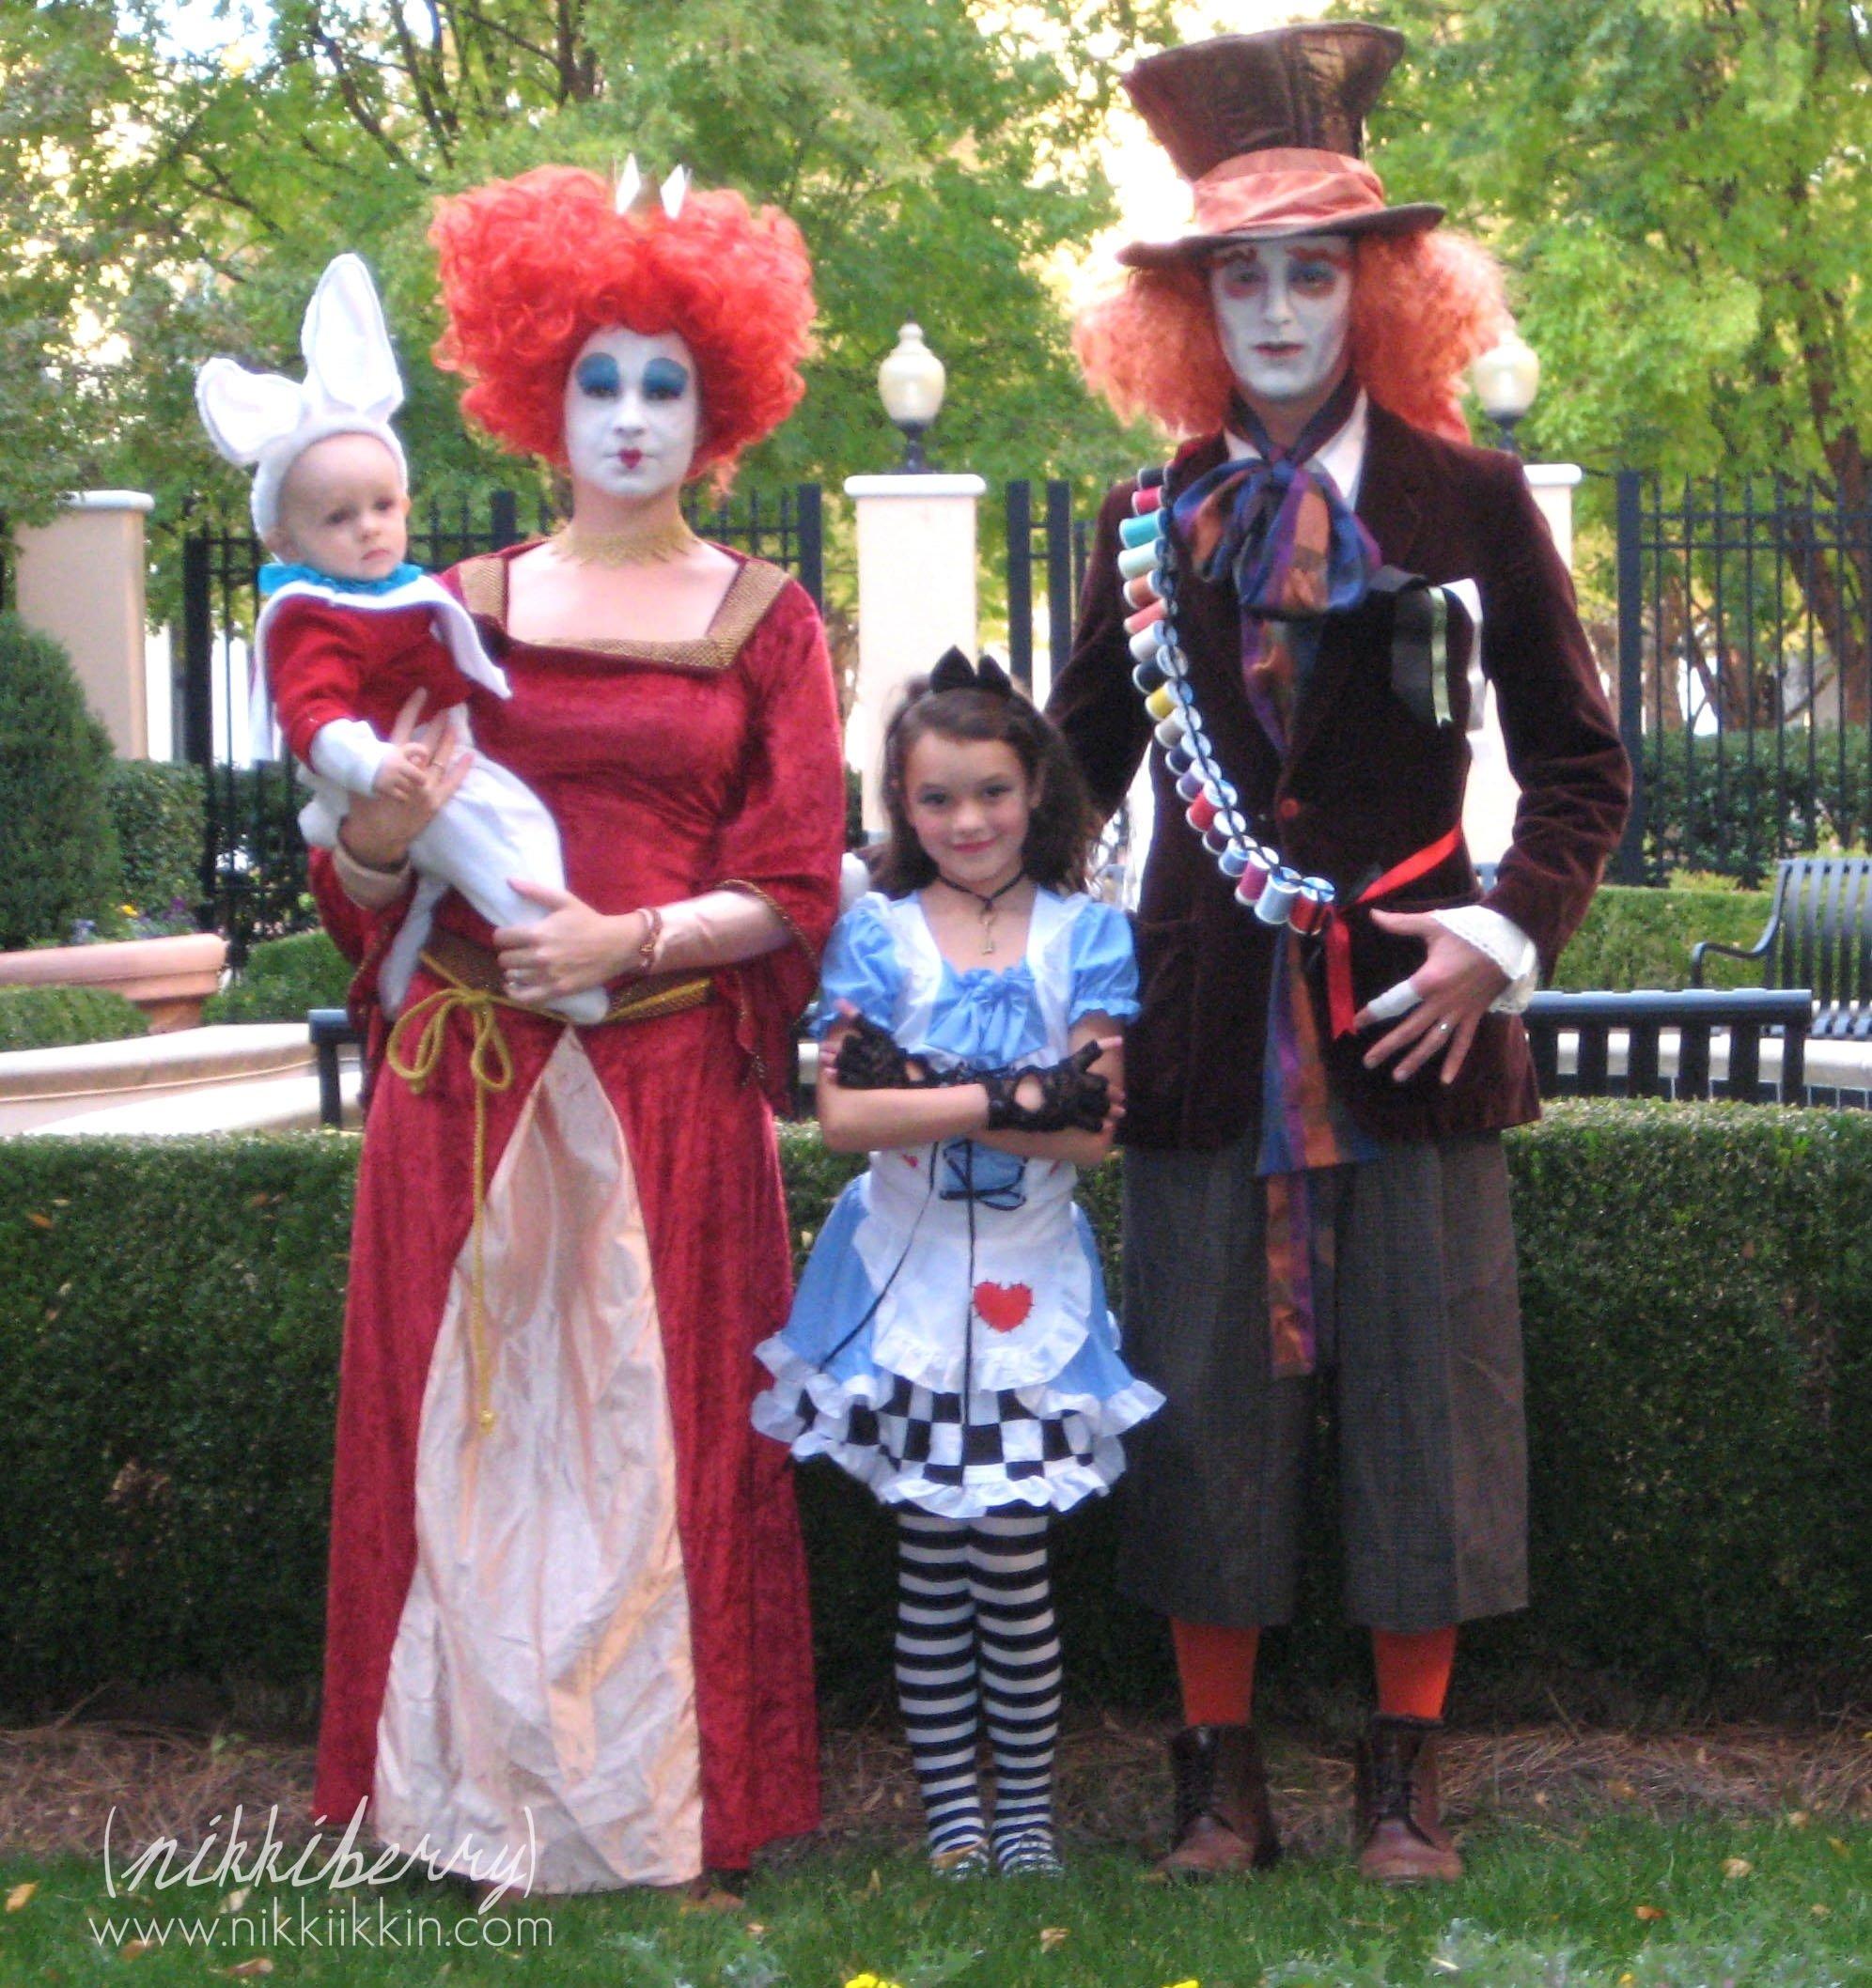 10 Gorgeous Alice And Wonderland Costume Ideas 25 awesome family costume ideas family halloween halloween 5 2020